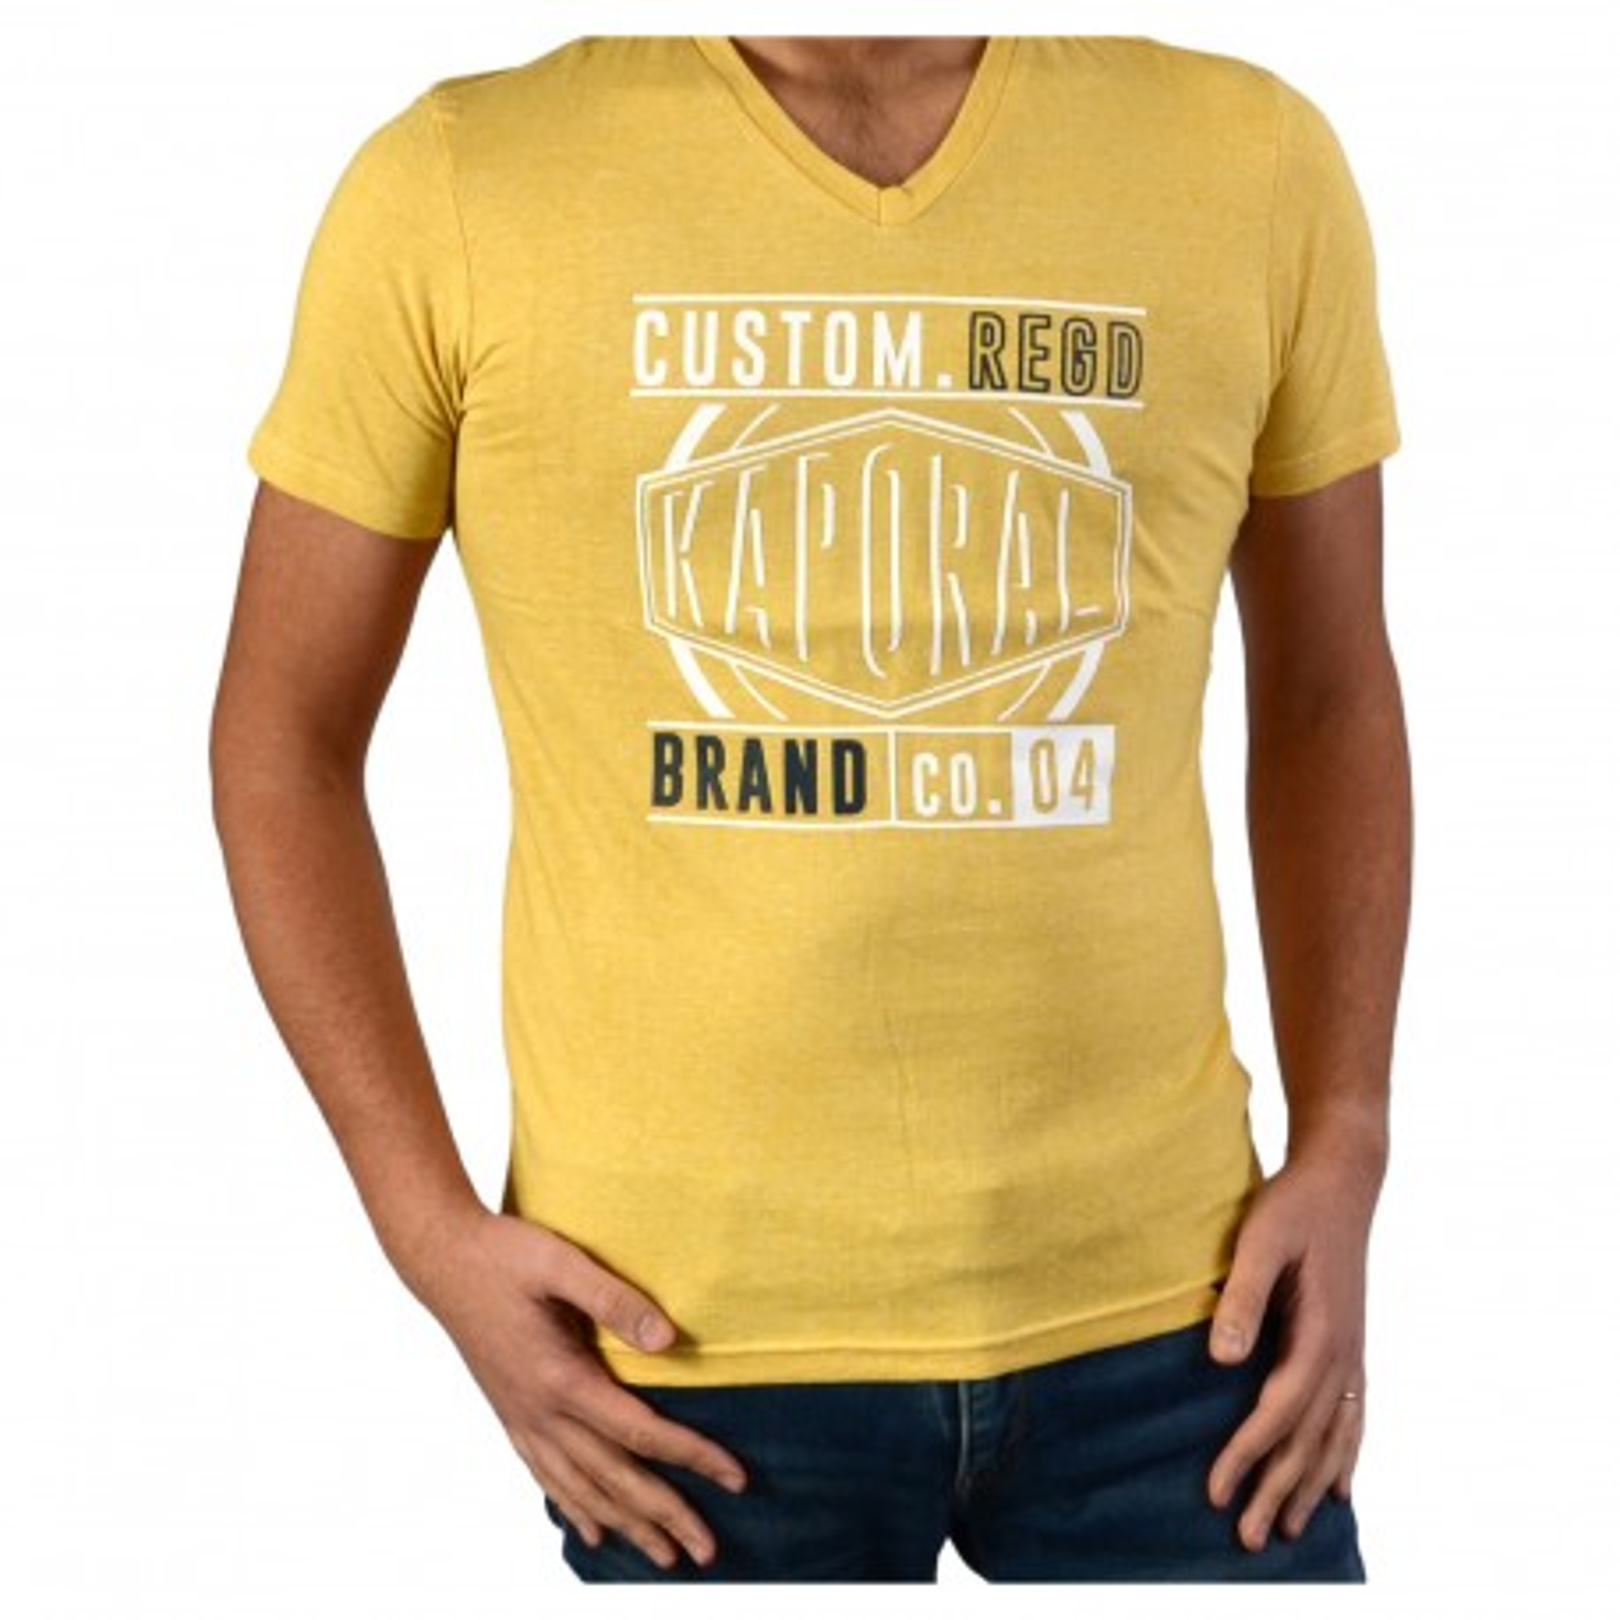 Tee Shirt Kaporal Moha